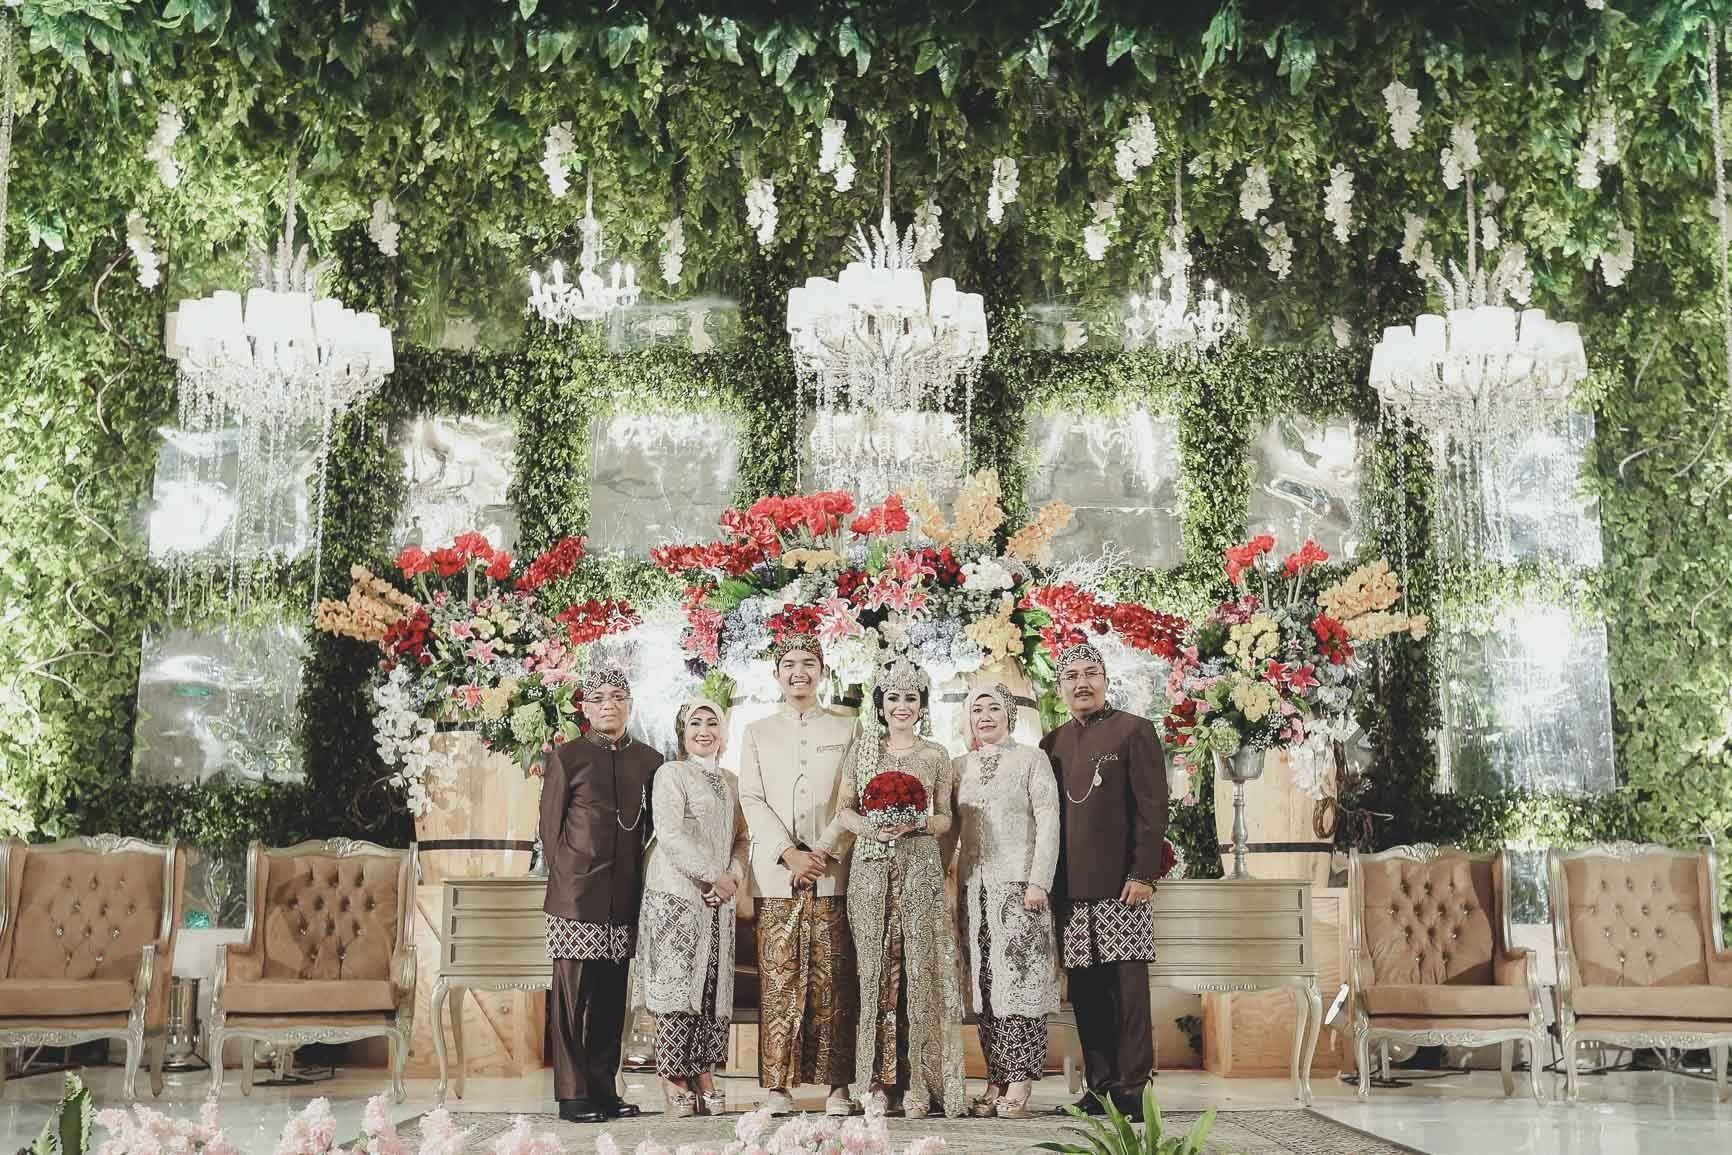 Garden Wedding Tema Pernikahan Latar Belakang Pernikahan Pernikahan